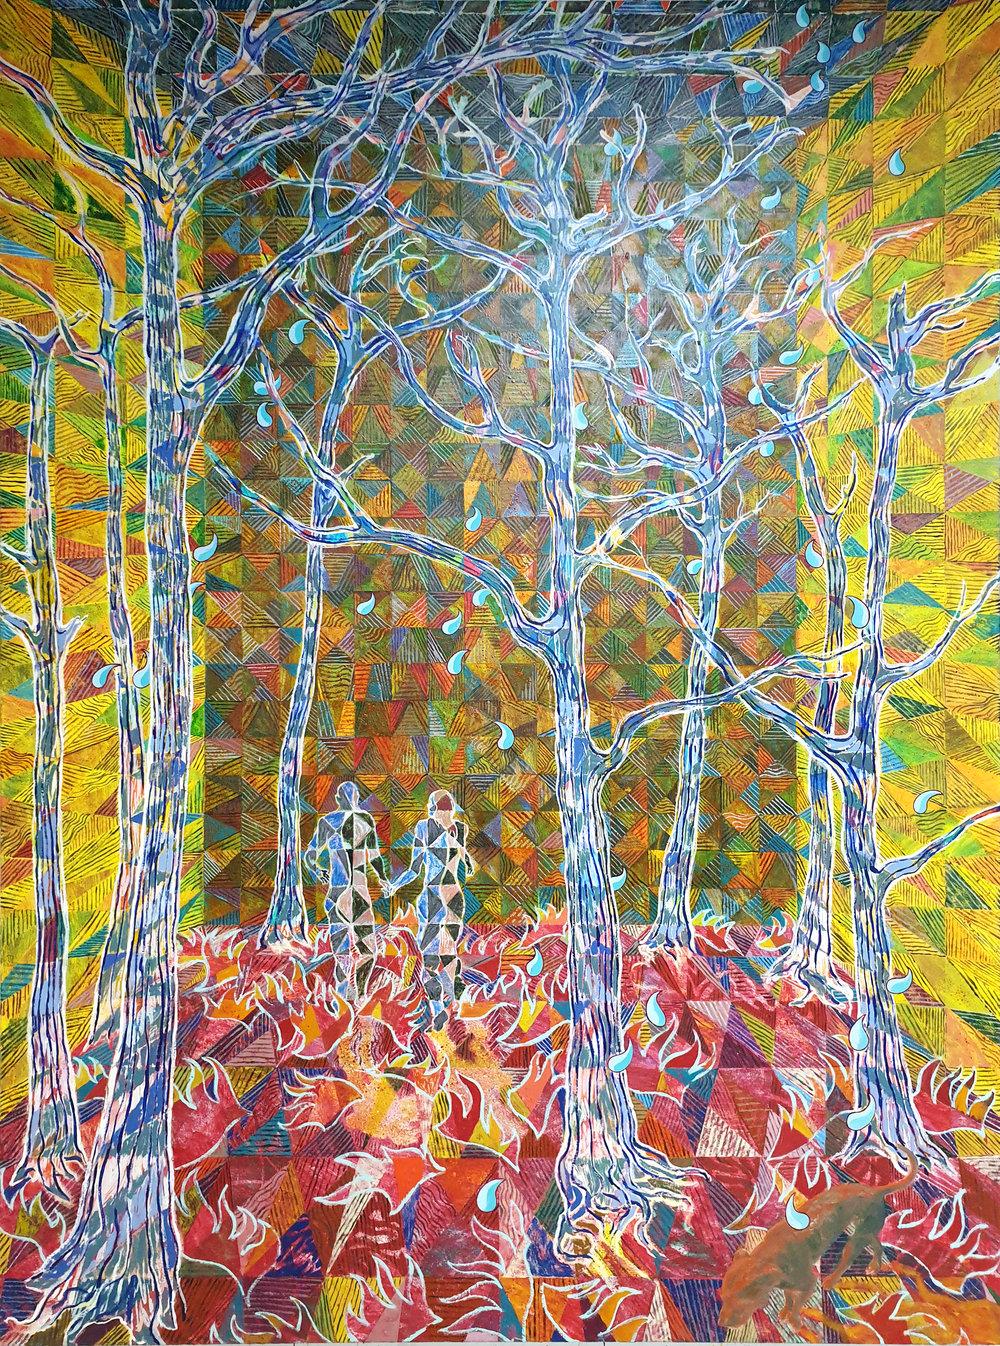 Josh Raz, Folie a Deux, Oil on canvas, 135 x 180cm, 2019.jpg